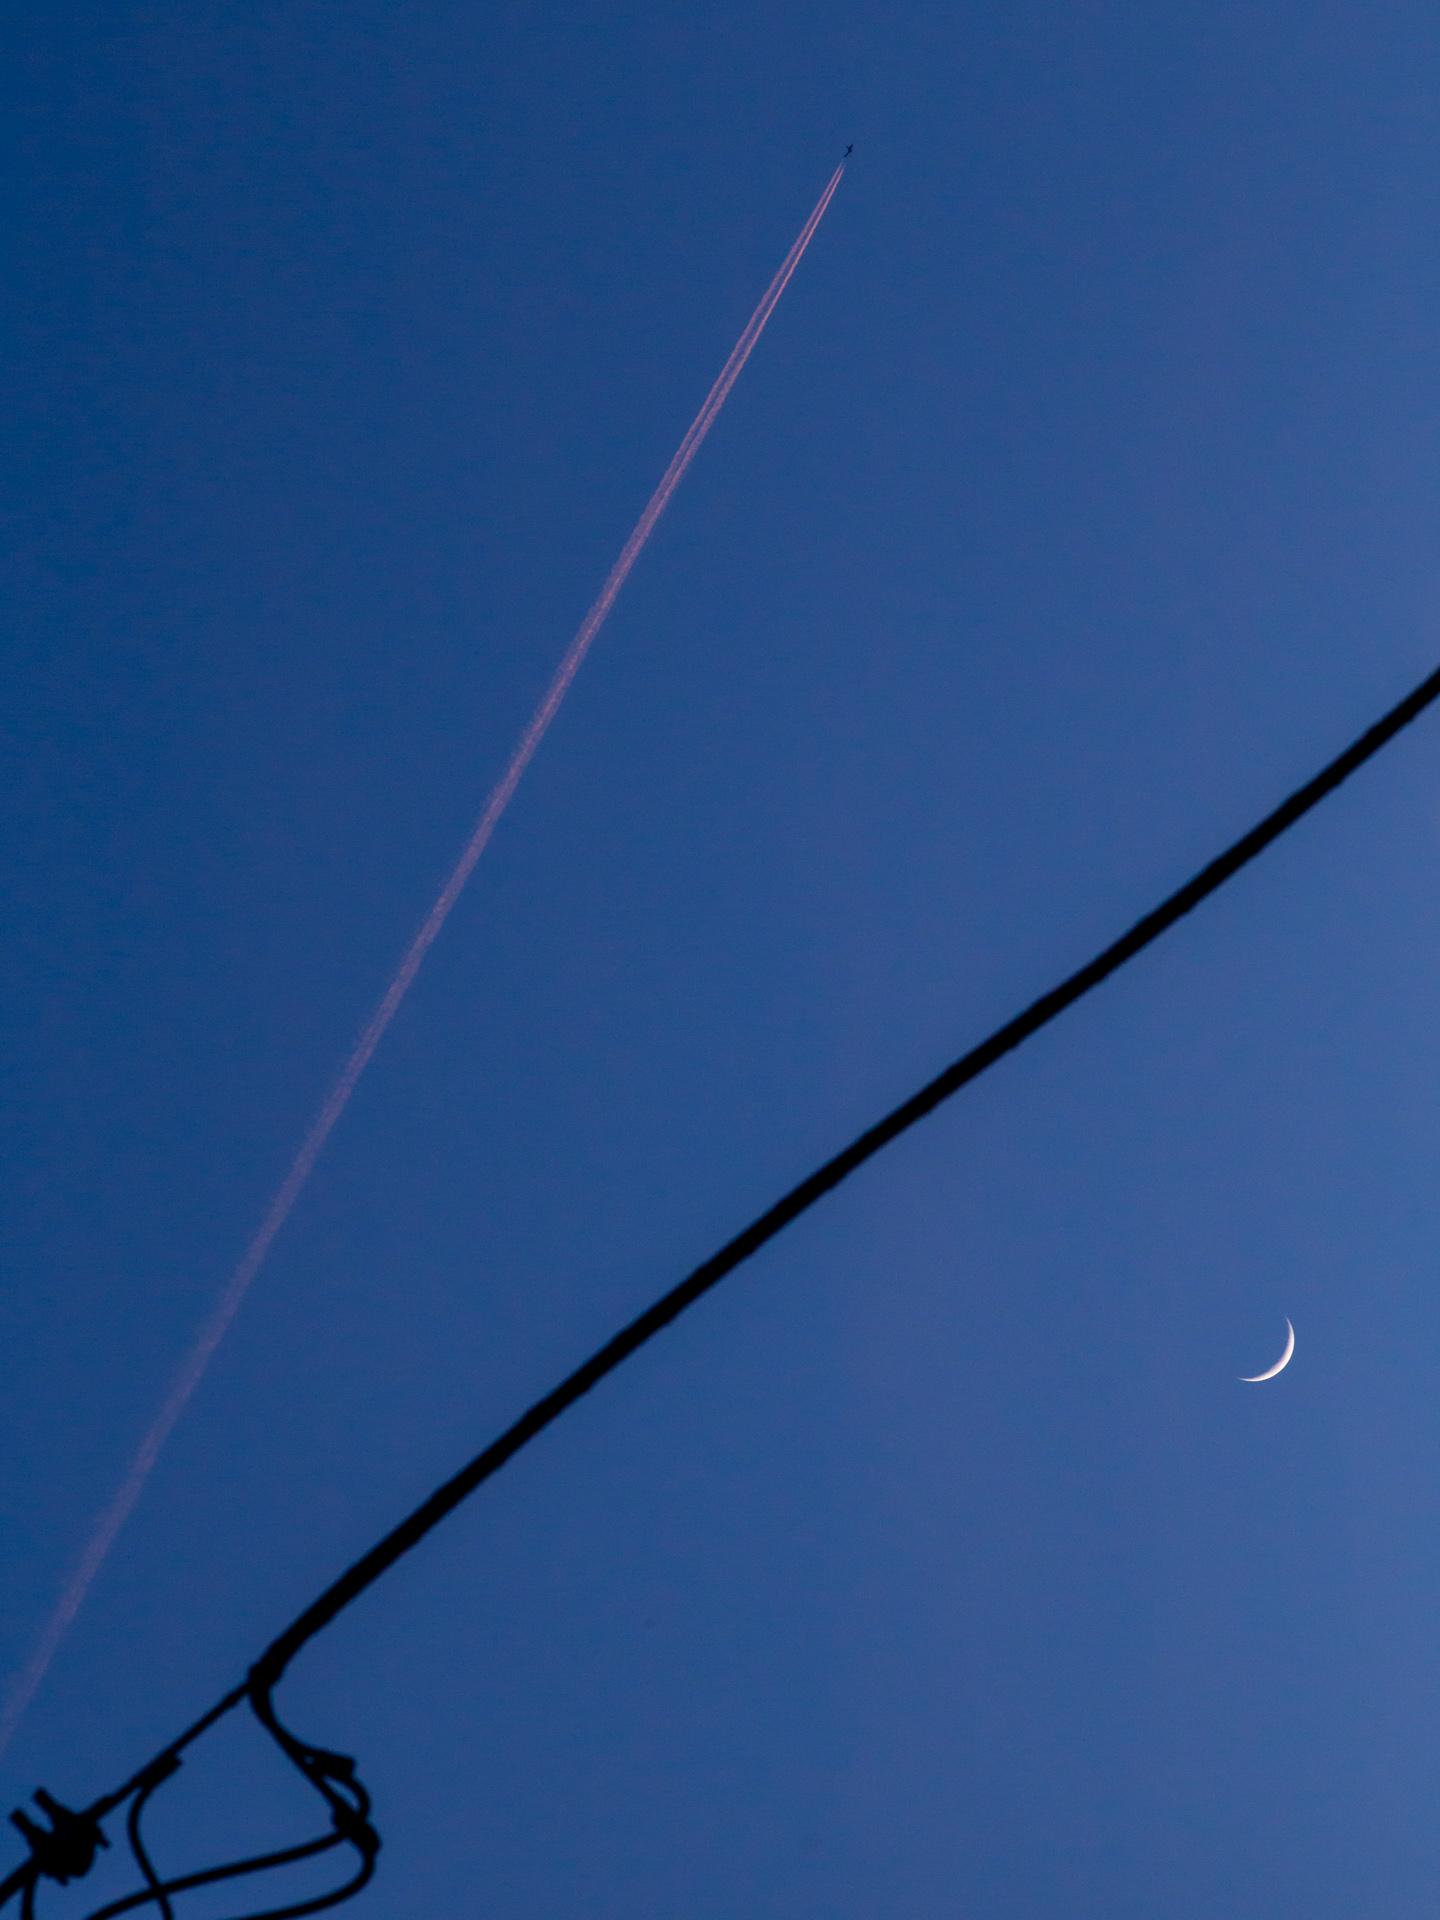 Moon with Wire & Plane | 20190507 2016 W:38.96x77.00@77m